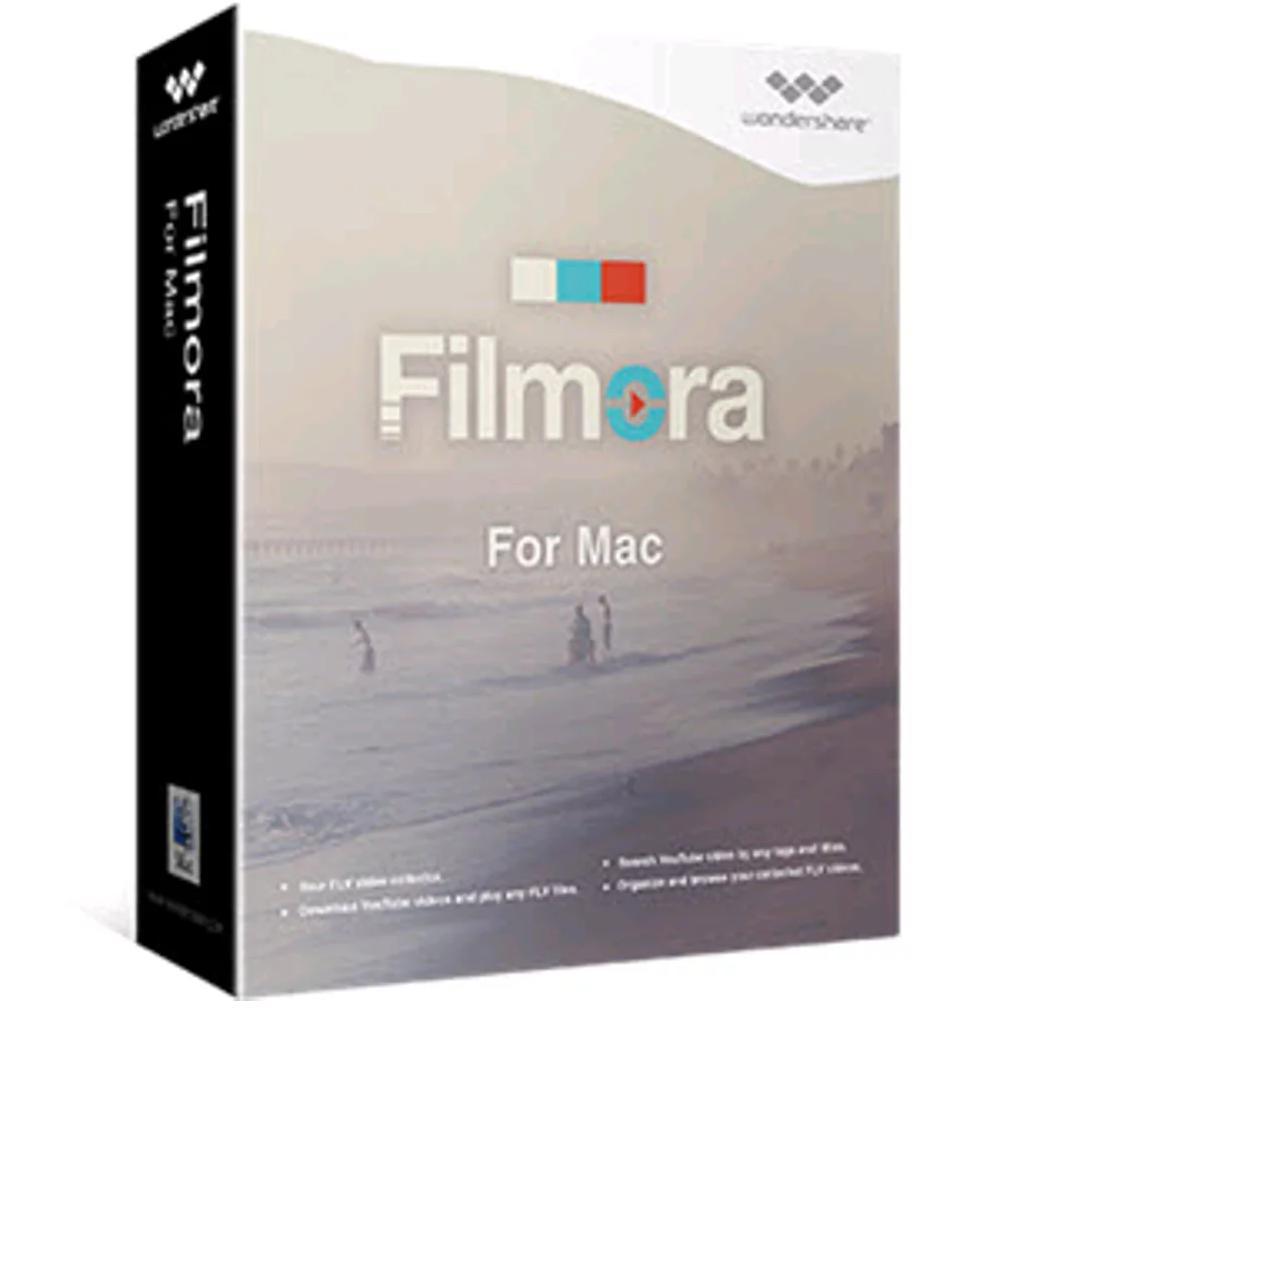 Office 365 Proplus Subscription Lifetime Original 5 Devices Free 5tb For Pcmac Onedrive 2016 Valid Detail Gambar Wondershare Filmora Video Editor Terbaru